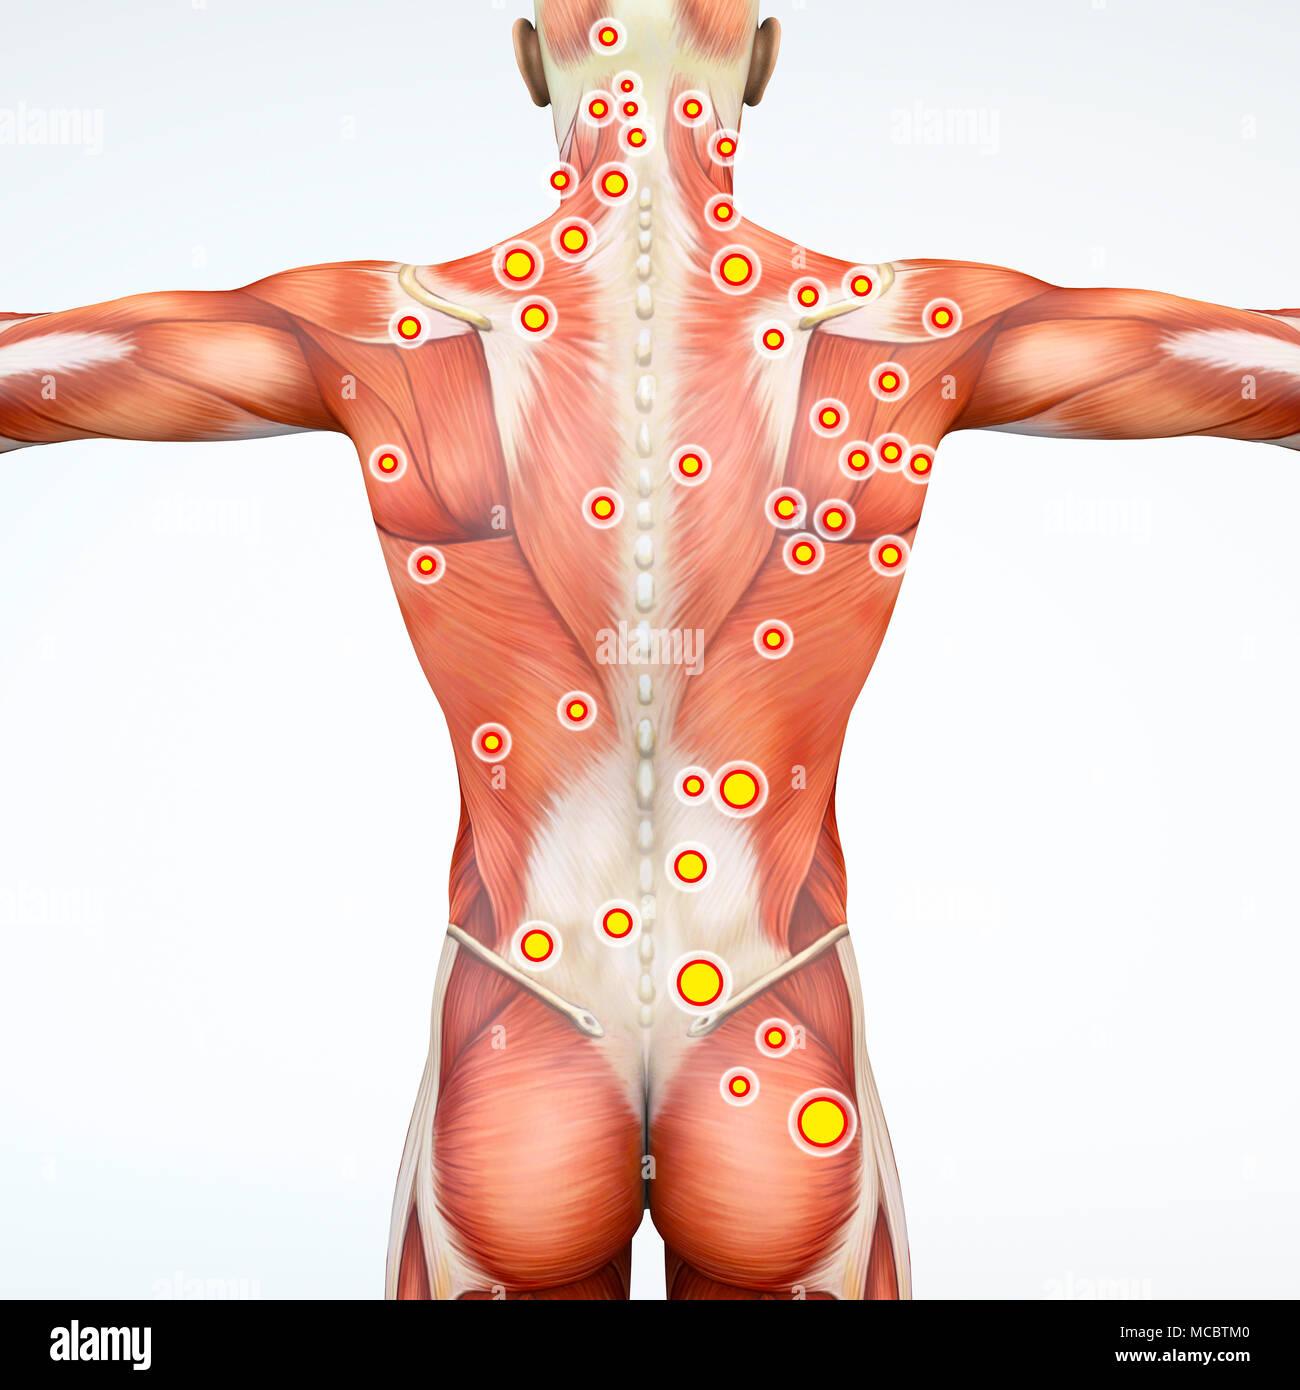 Moderno Anatomía Rata 3d Friso - Imágenes de Anatomía Humana ...